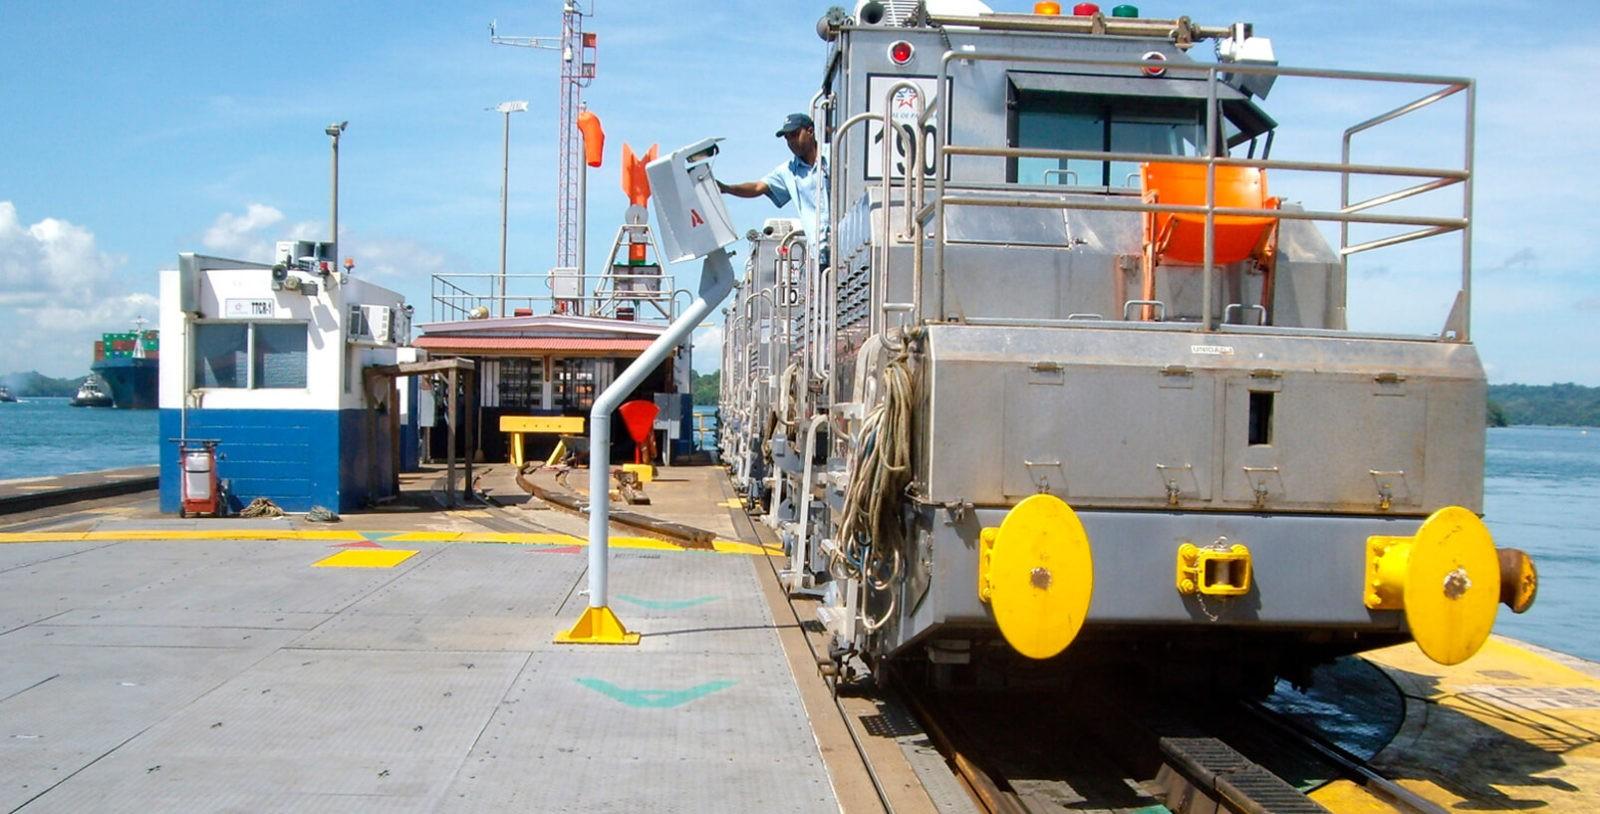 Locomotive_Turntables_Gatun_Locks_Panama_Canal_IDOM_6_